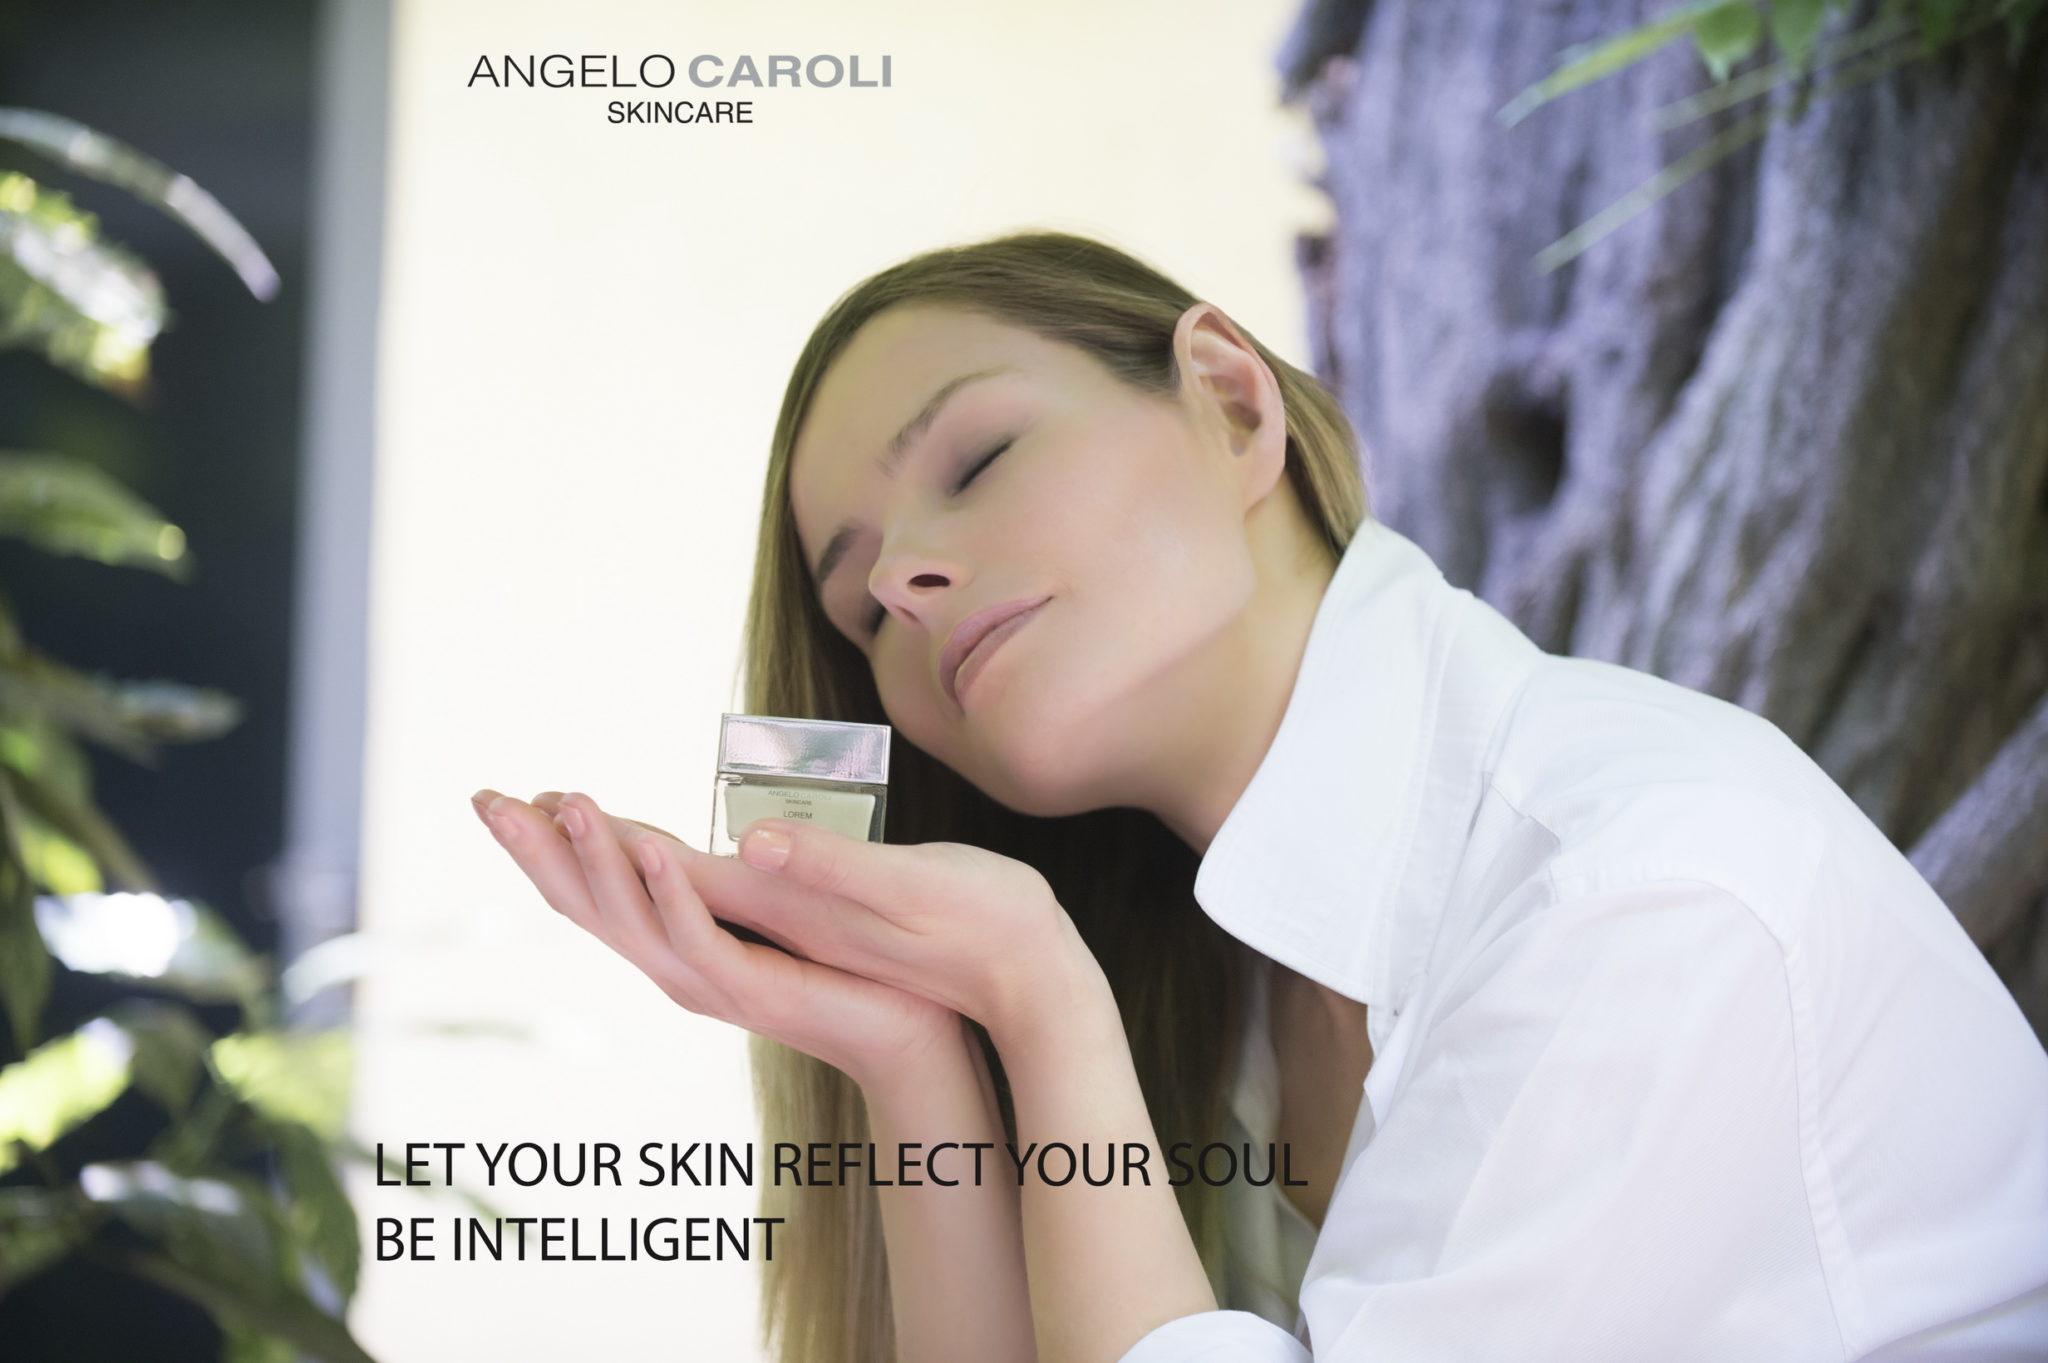 linda_pavlova_Kampan_angelo_caroli15_mmagazin6